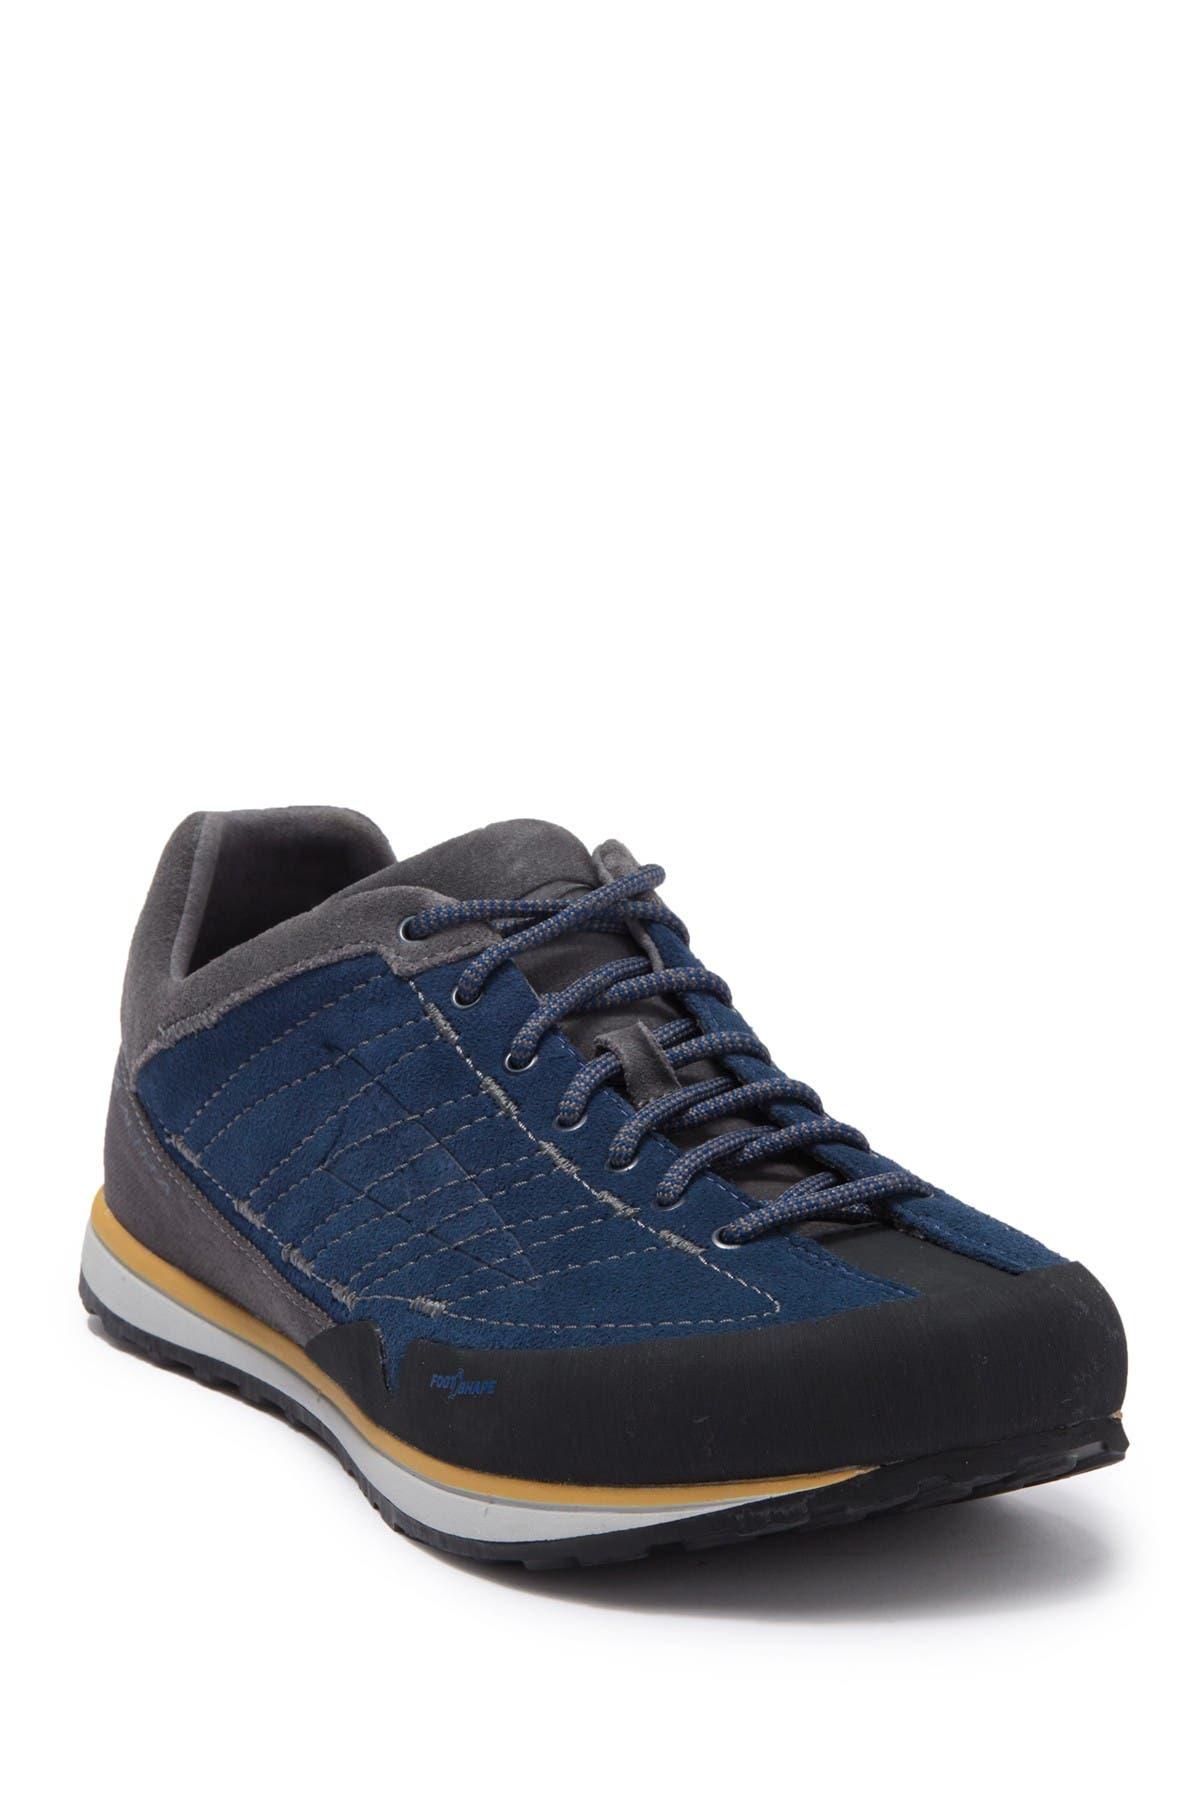 Image of ALTRA Grafton Hiking Shoe